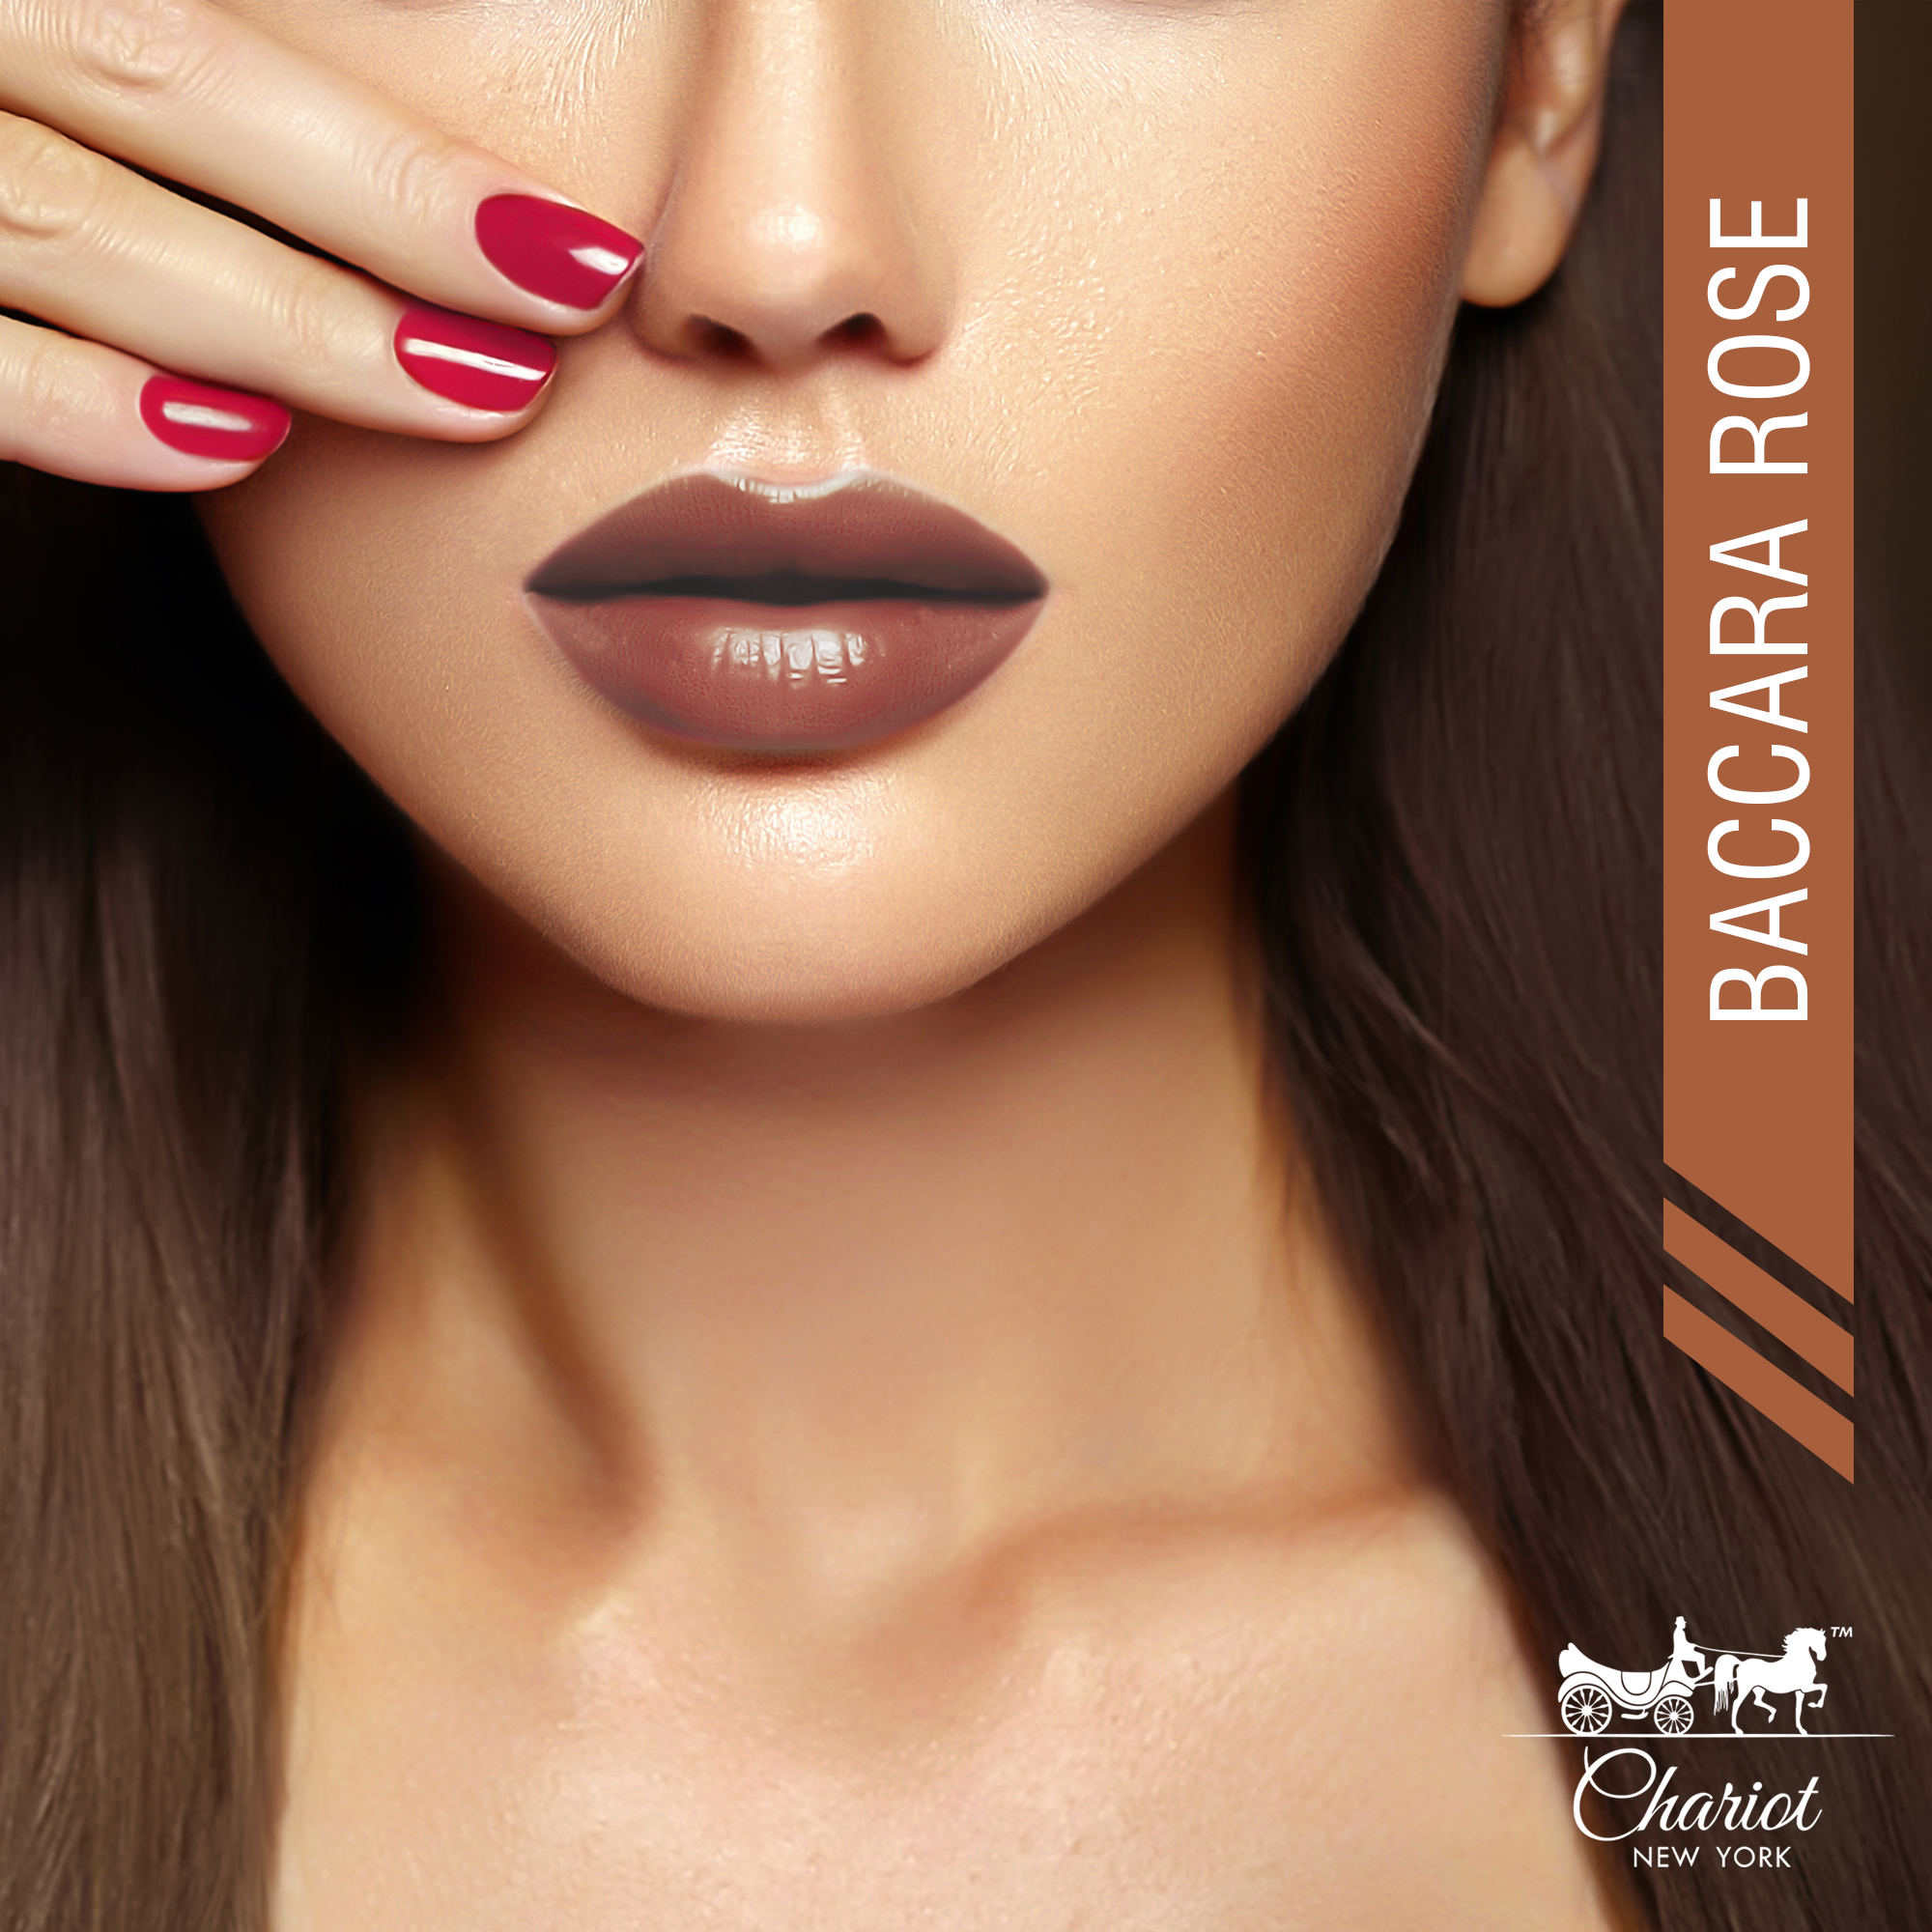 Chariot New York Baccara Rose Creme Lipstick (Brown)